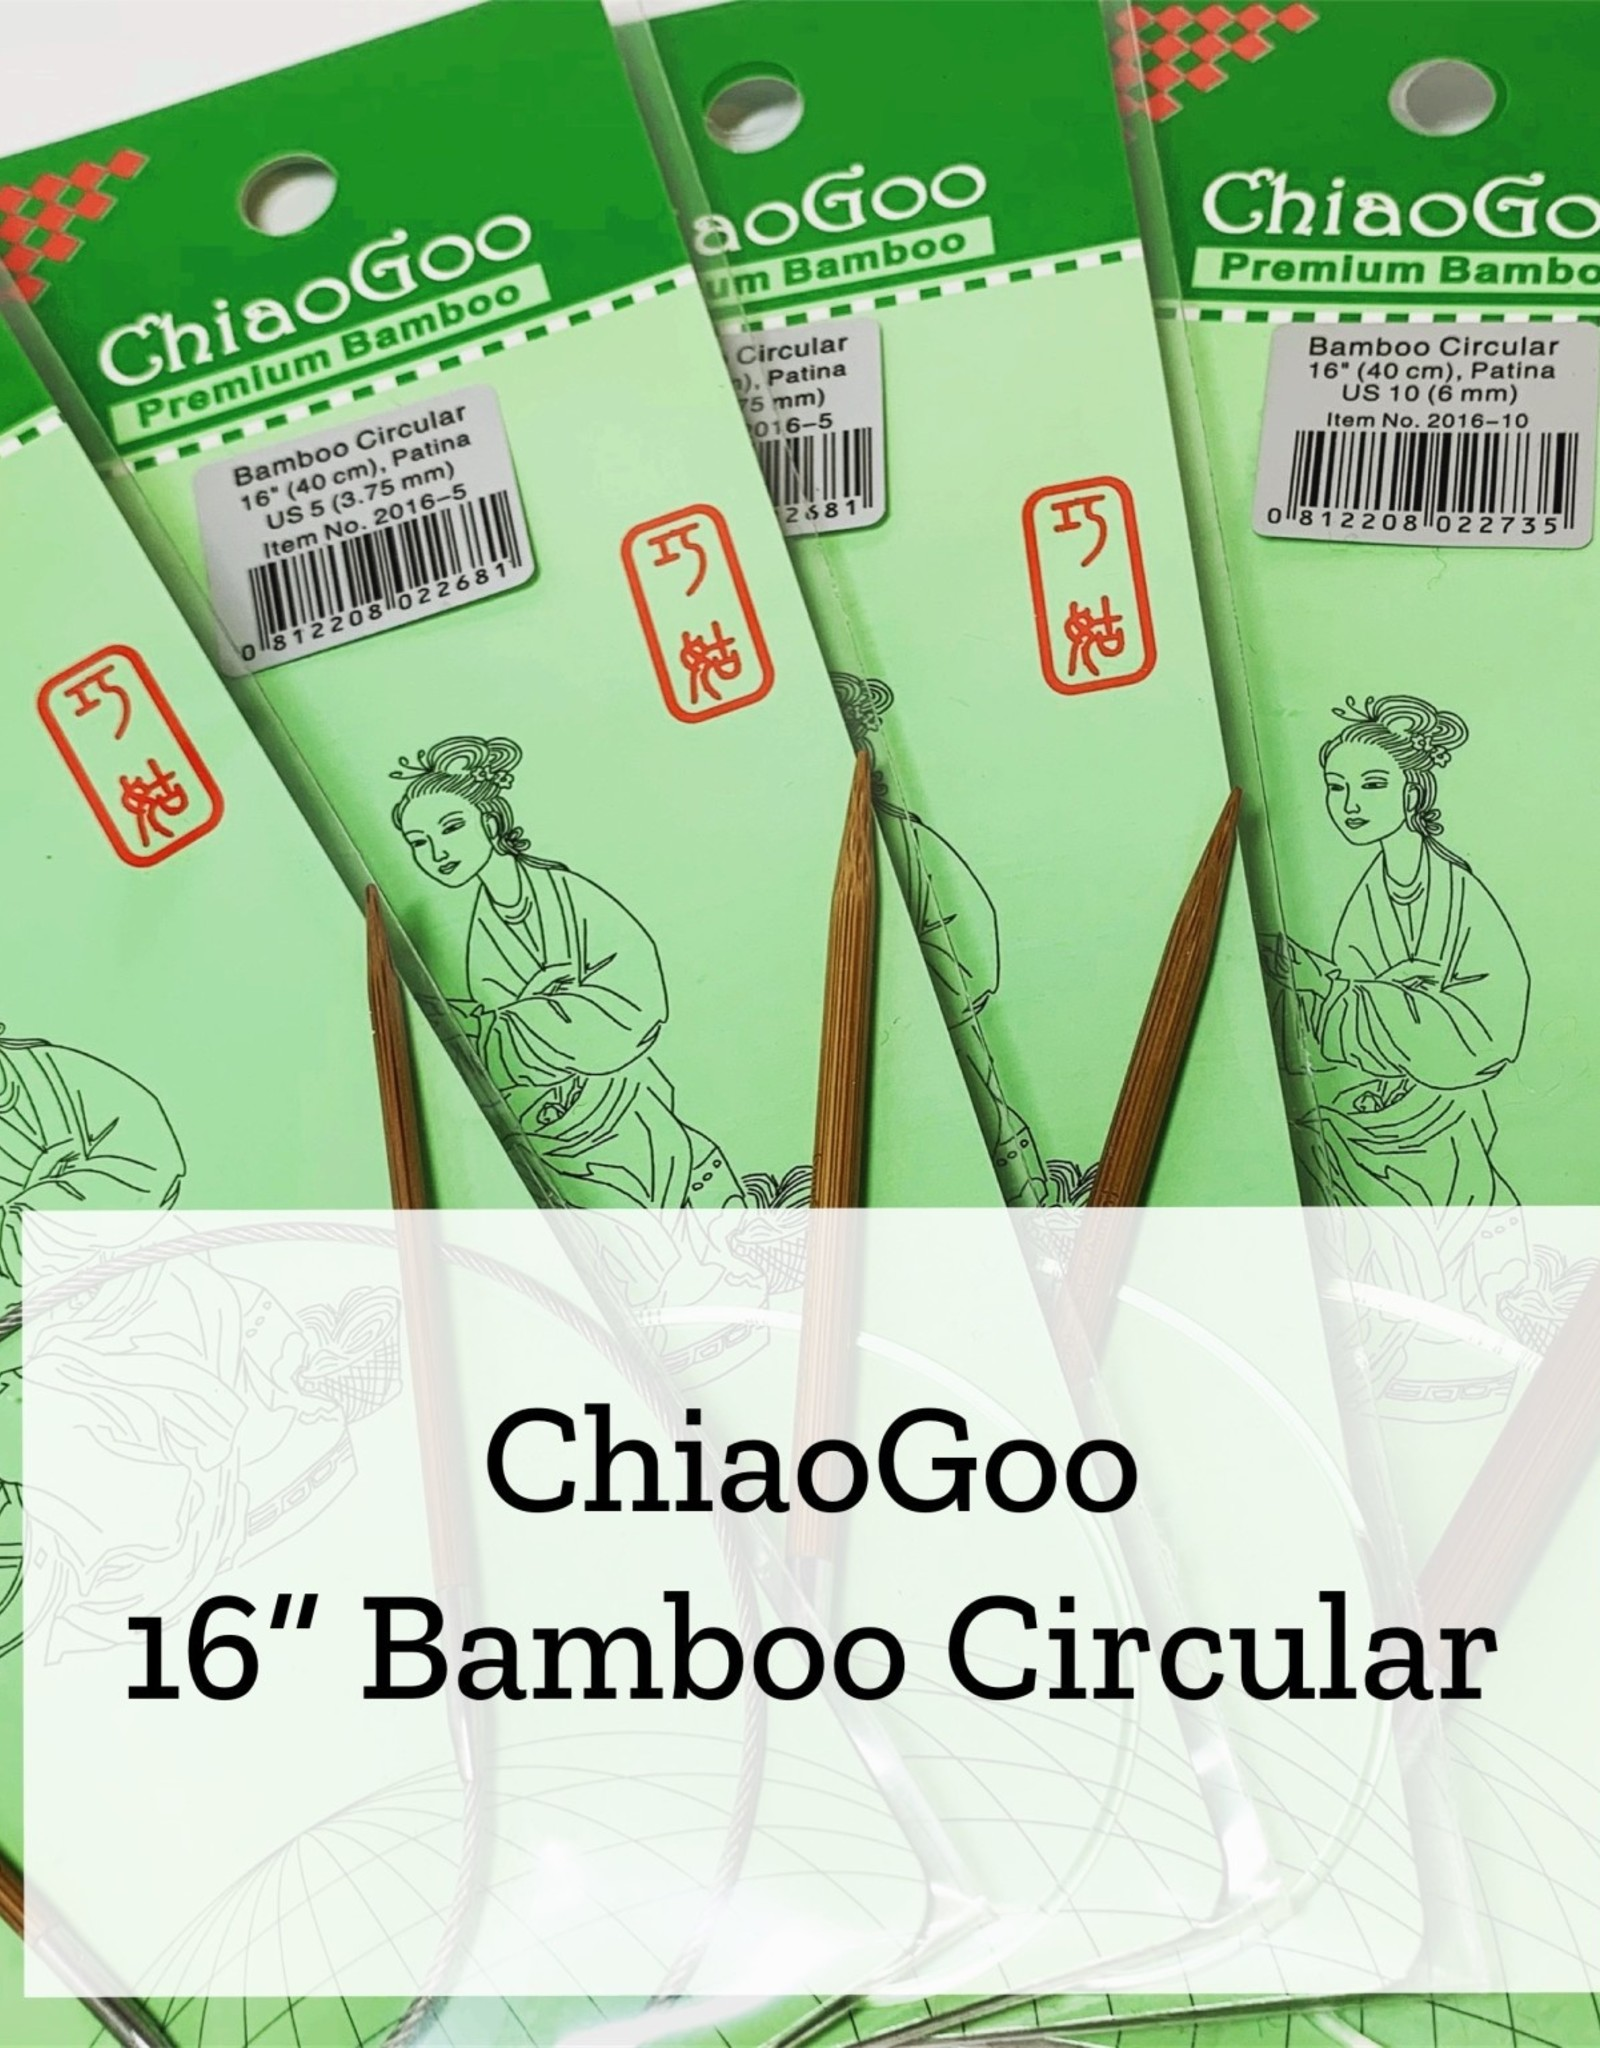 "ChiaoGoo Bam 16"" 5mm"